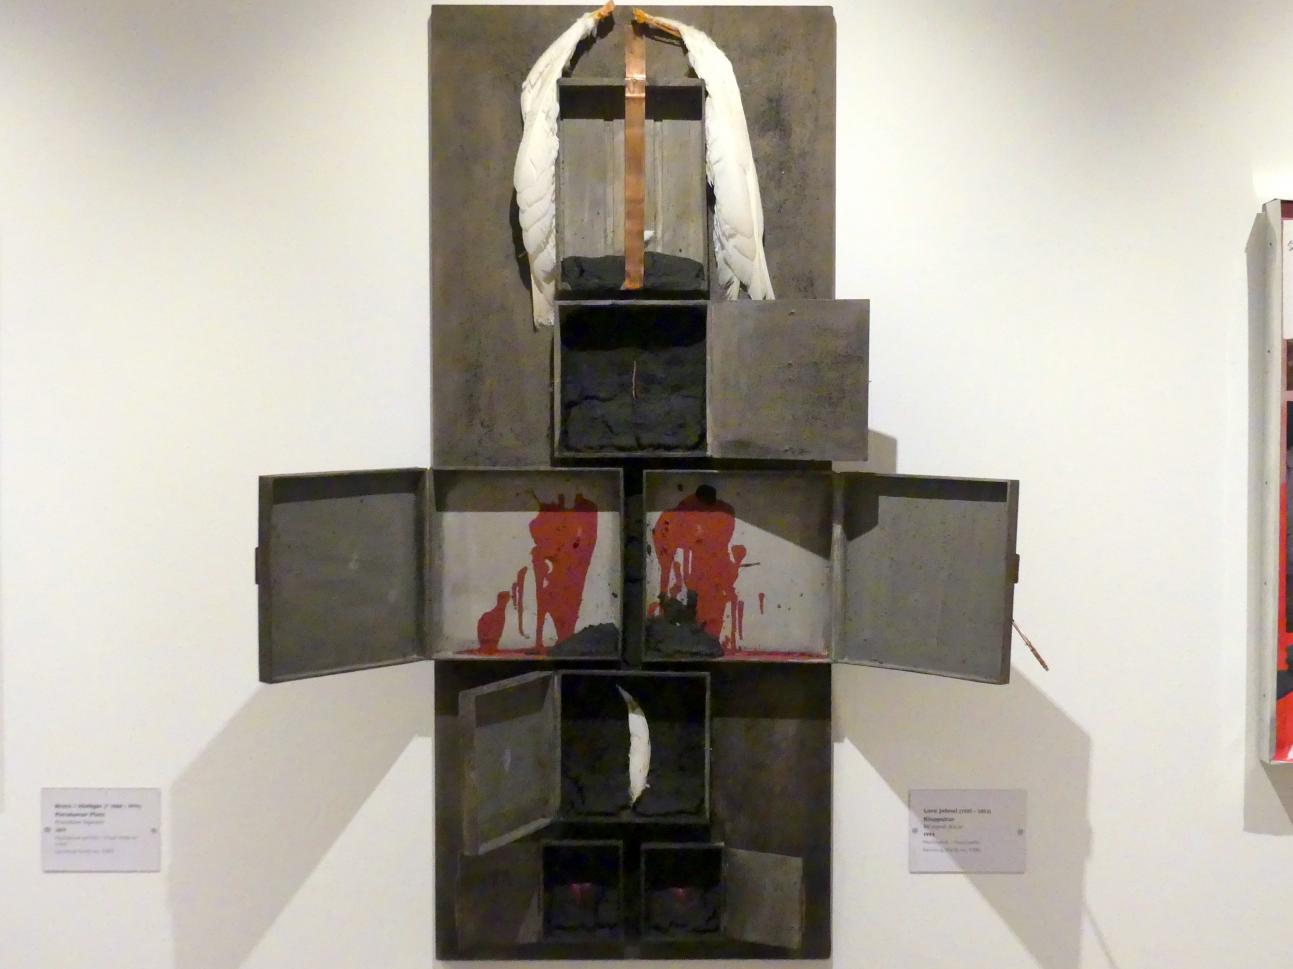 Lore Jahnel: Klappaltar, 1994